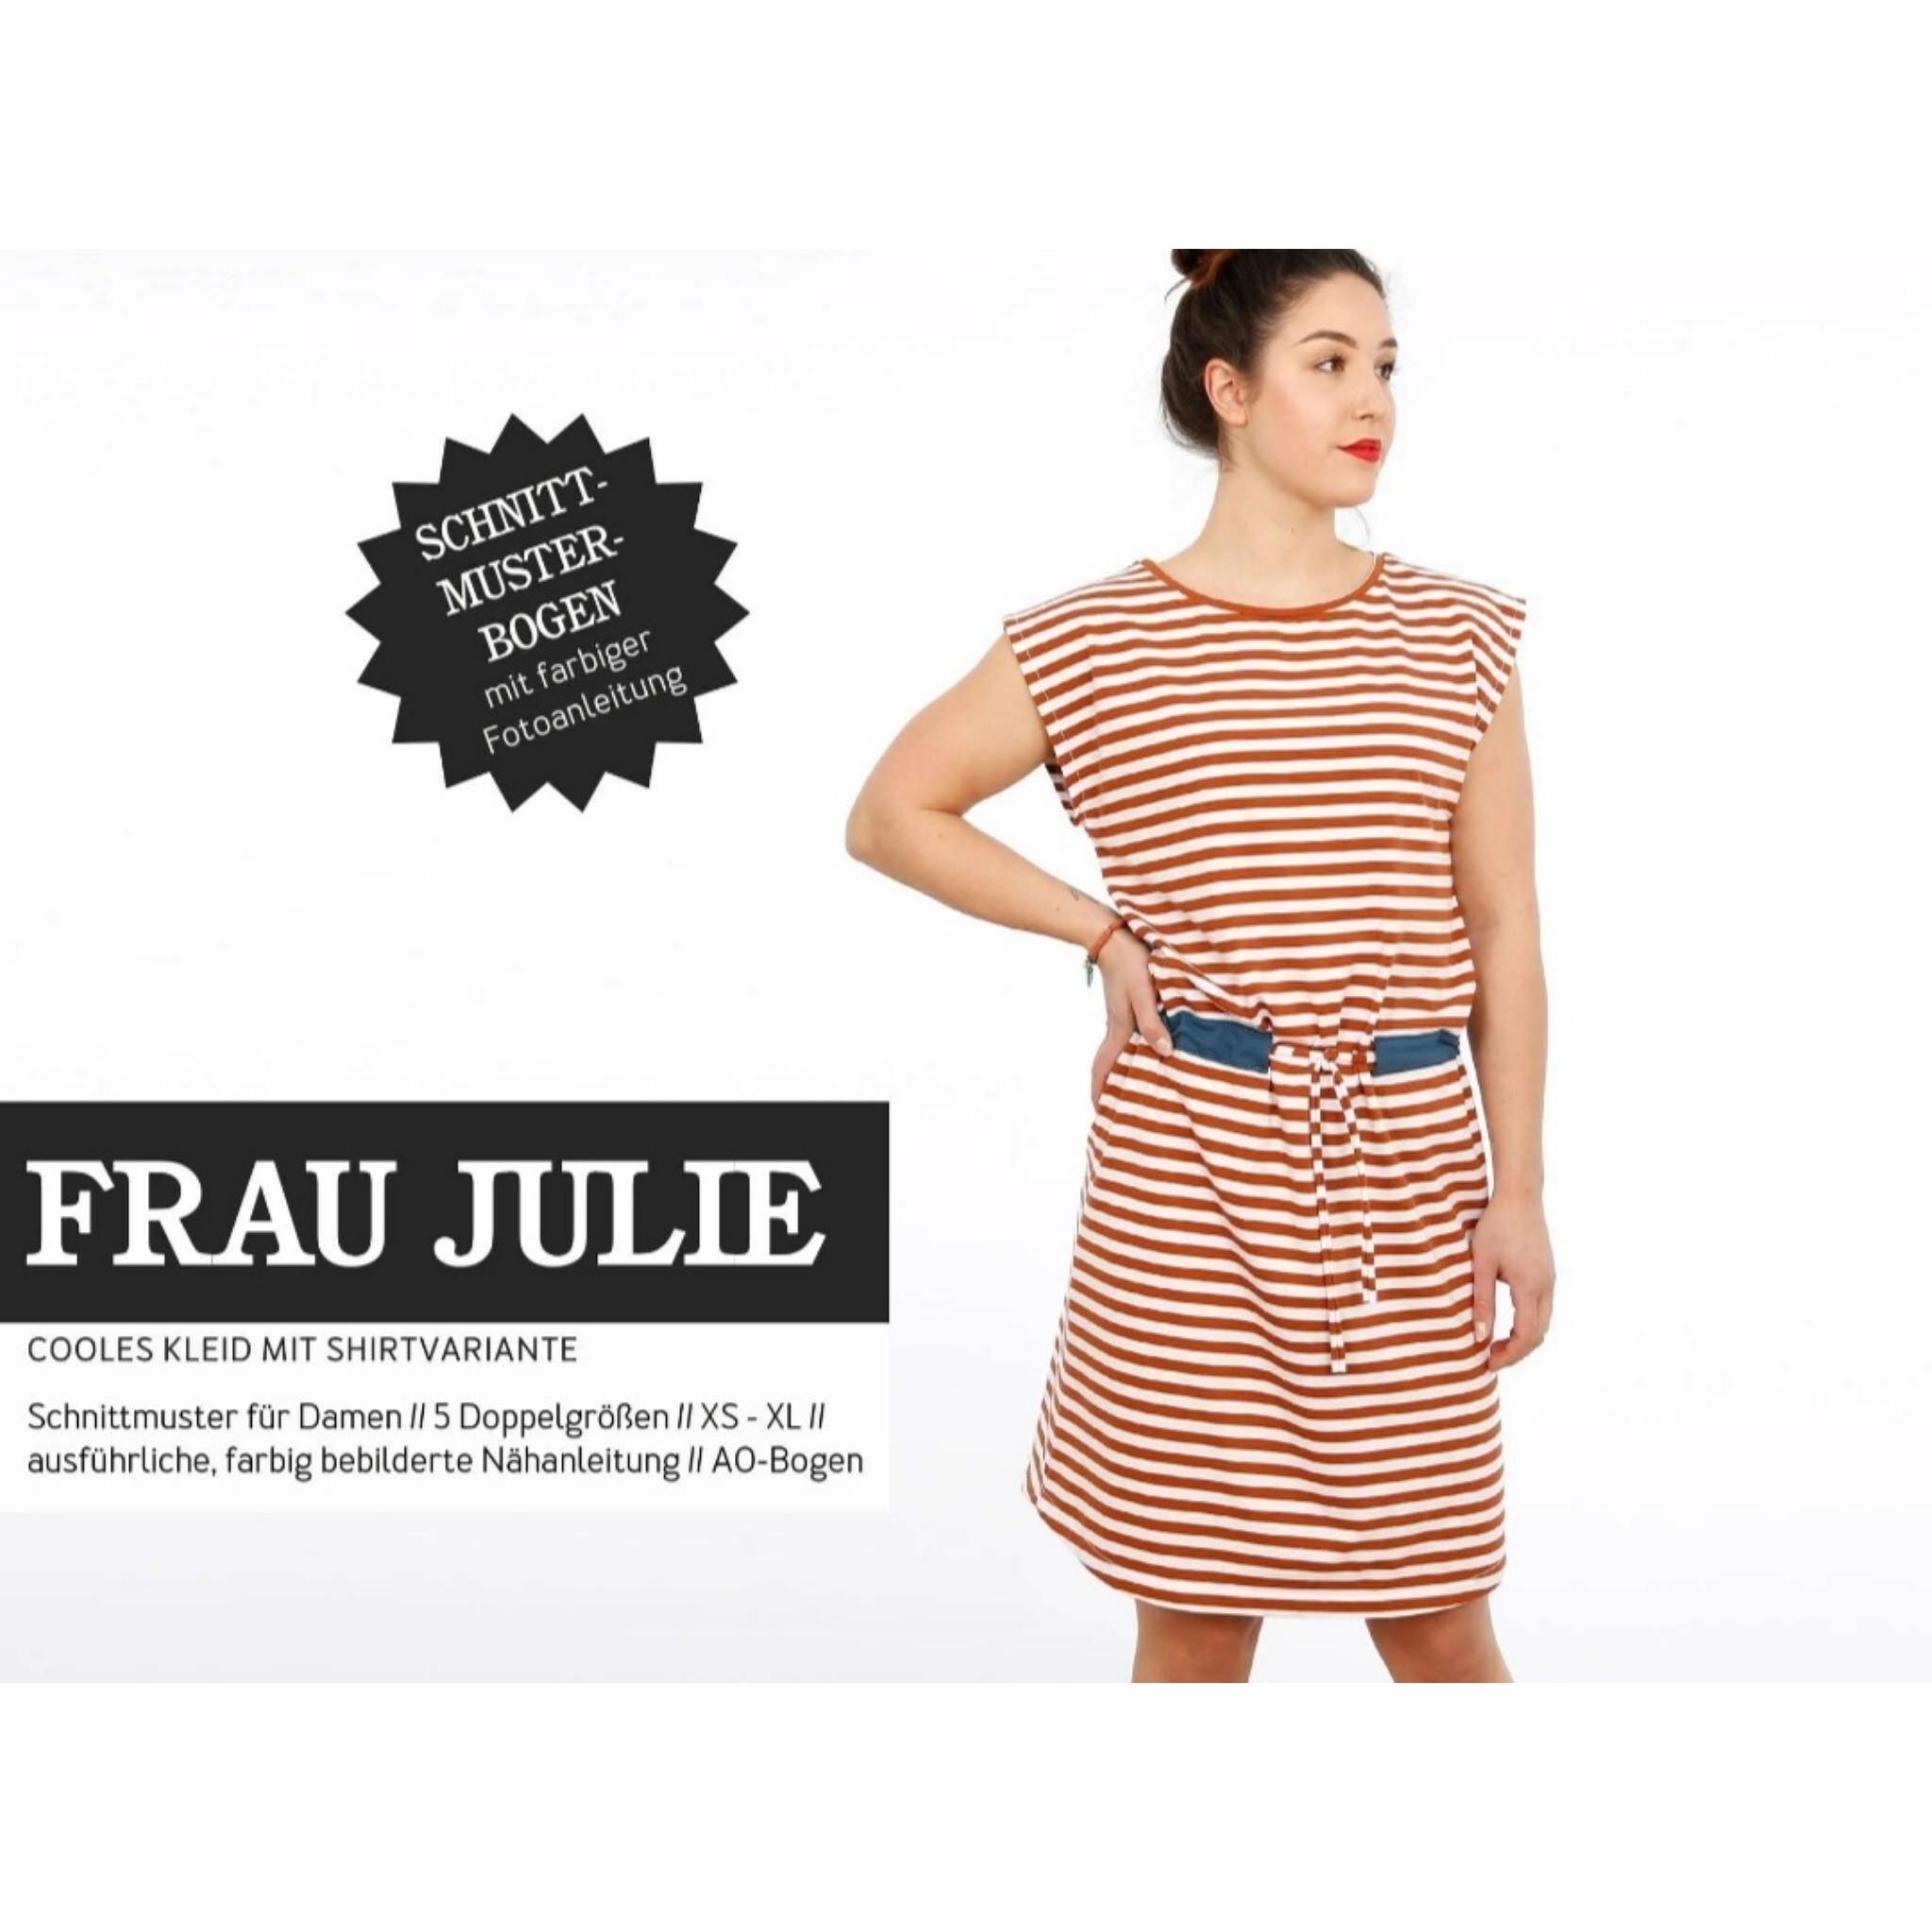 FRAU julie schnittmuster studio schnittreif